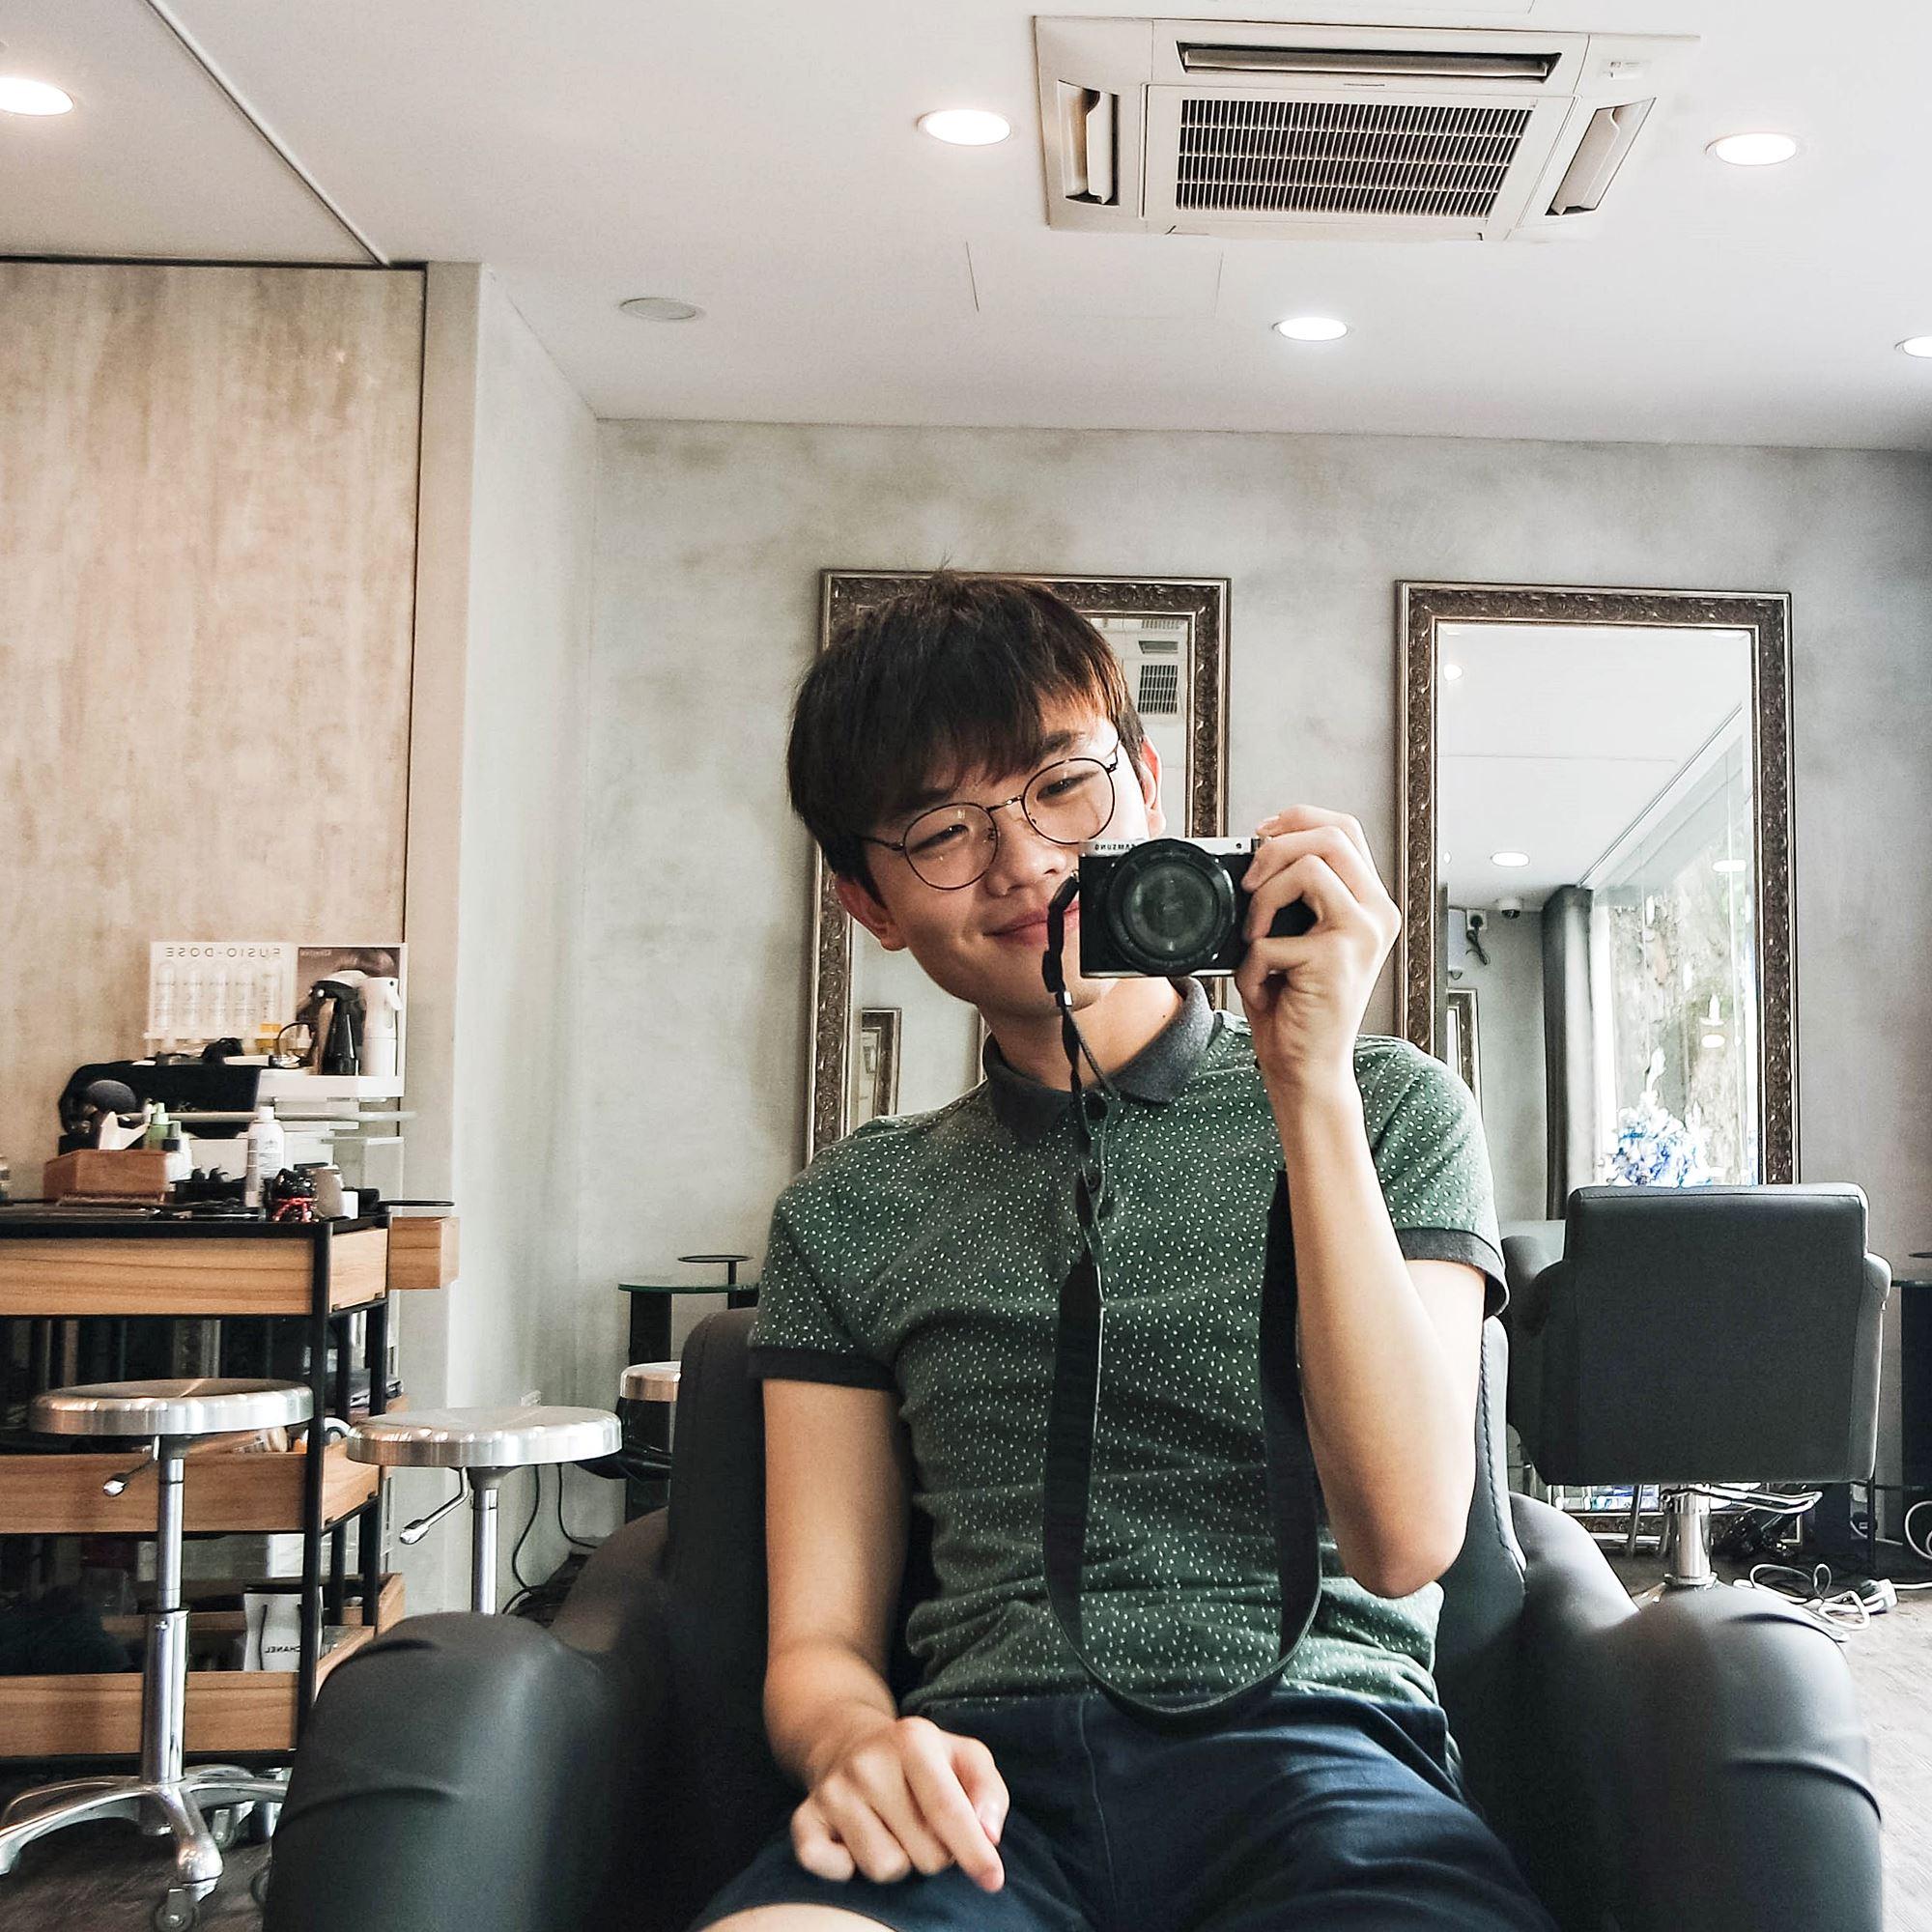 Salon Kream - Mucota Scena Hair Treatment